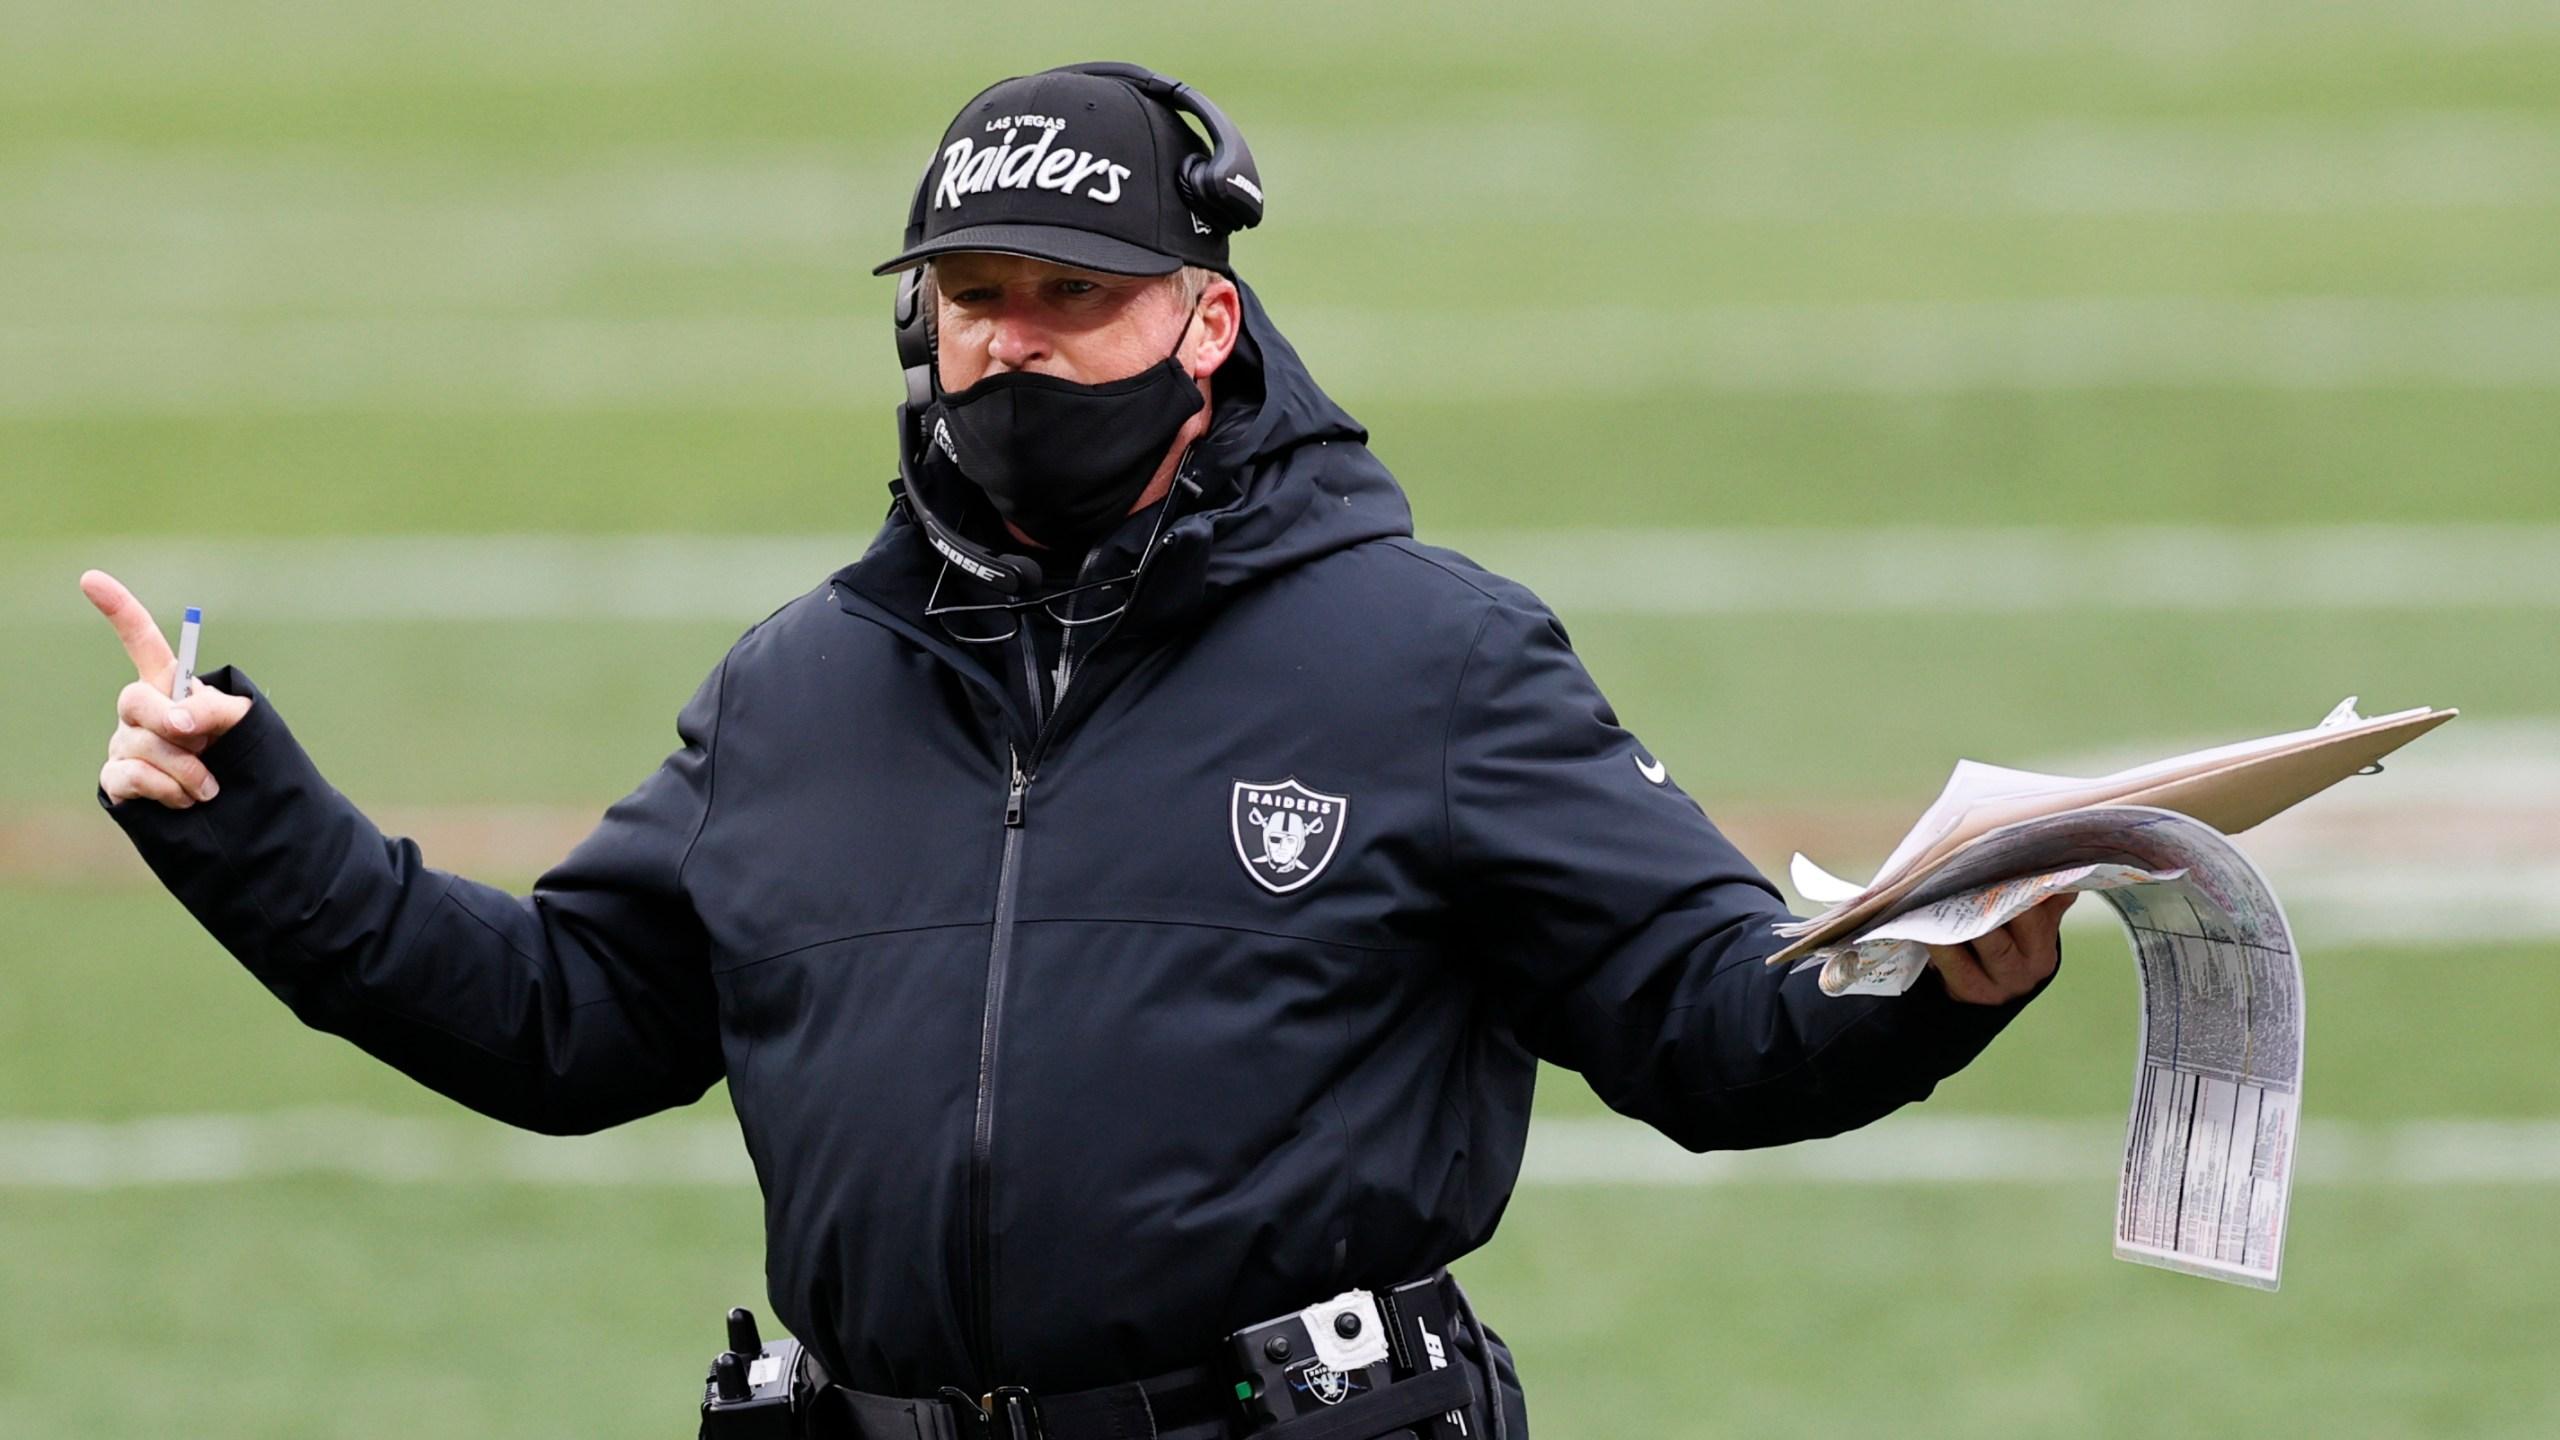 Source Raiders Fined 650k Docked Draft Pick For Repeated Covid 19 Violations Ktla